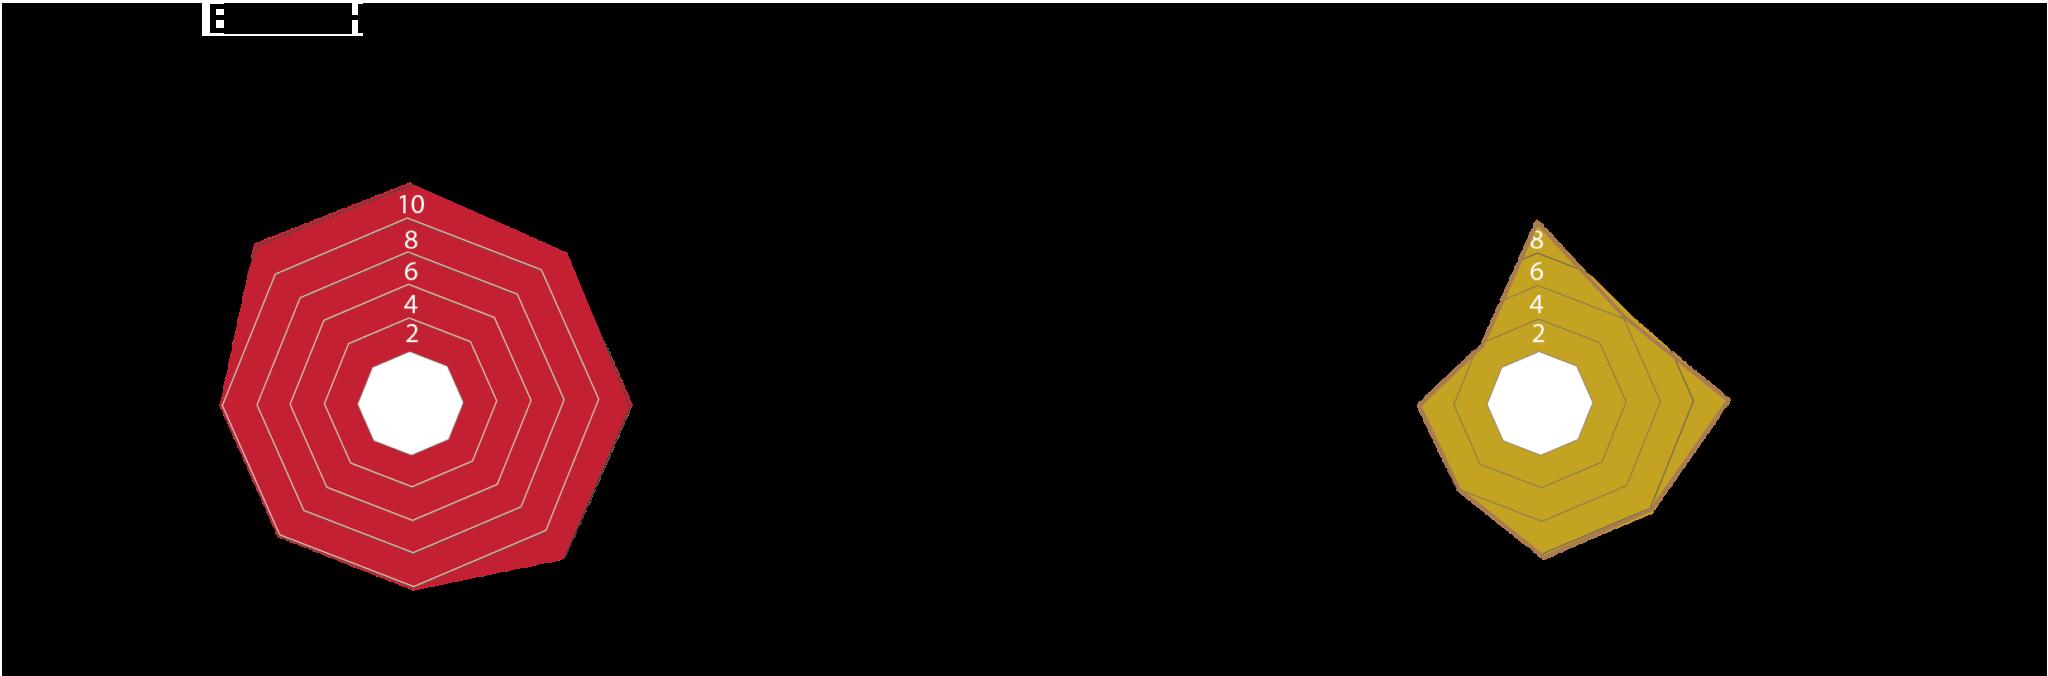 LT-Series LifTime Locks